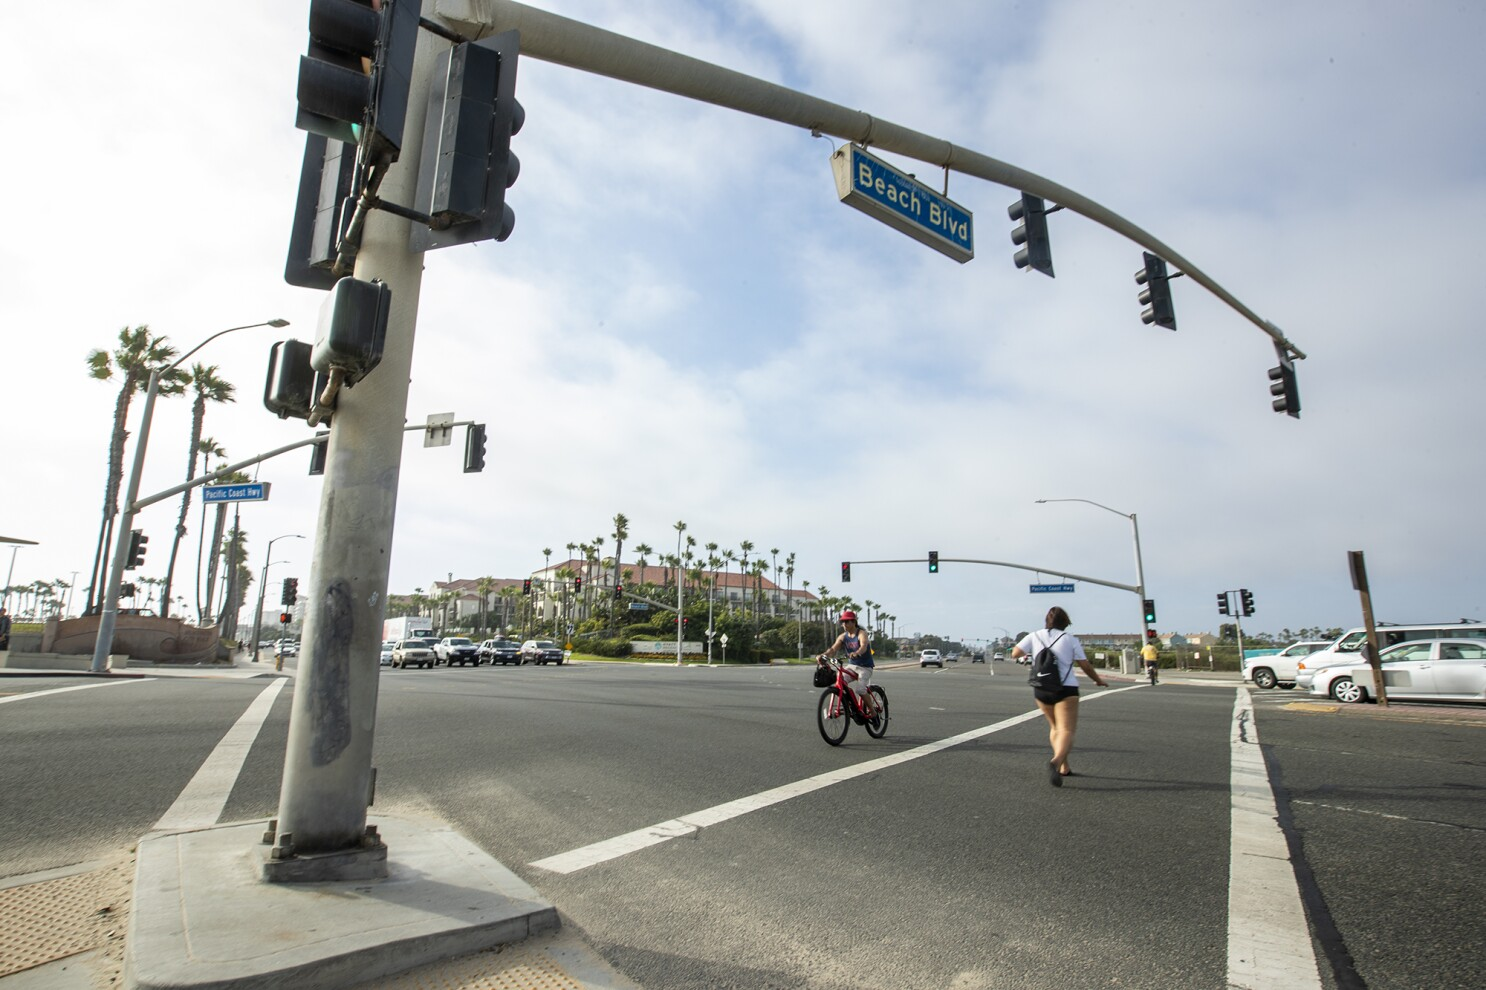 Cities team up to highlight Beach Boulevard improvements